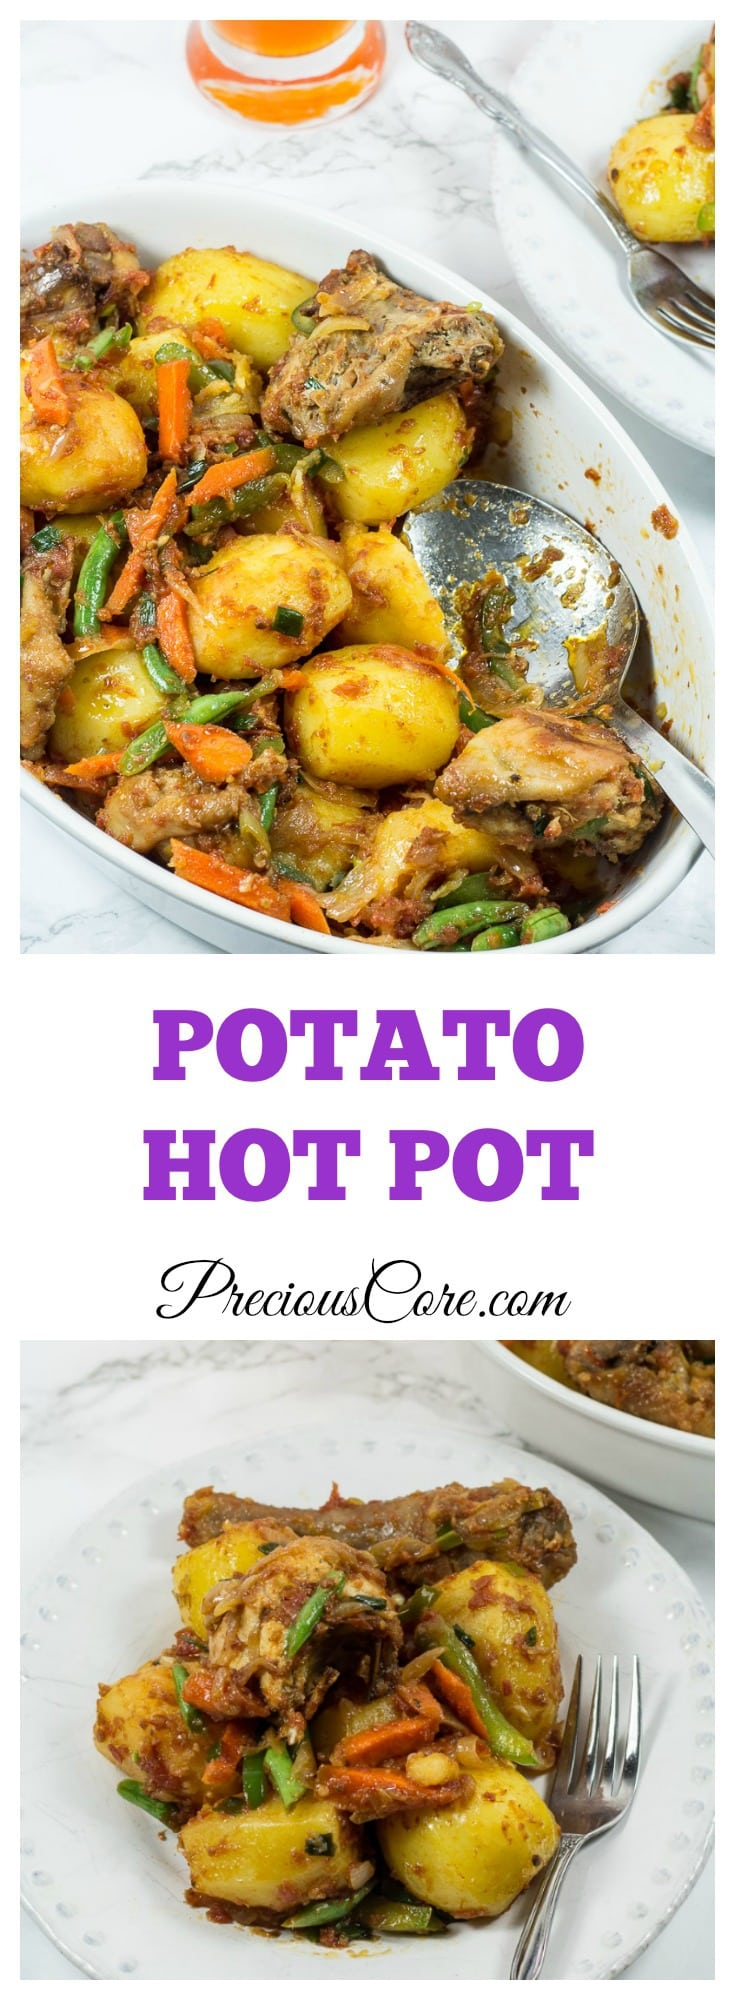 how to make potato hot pot